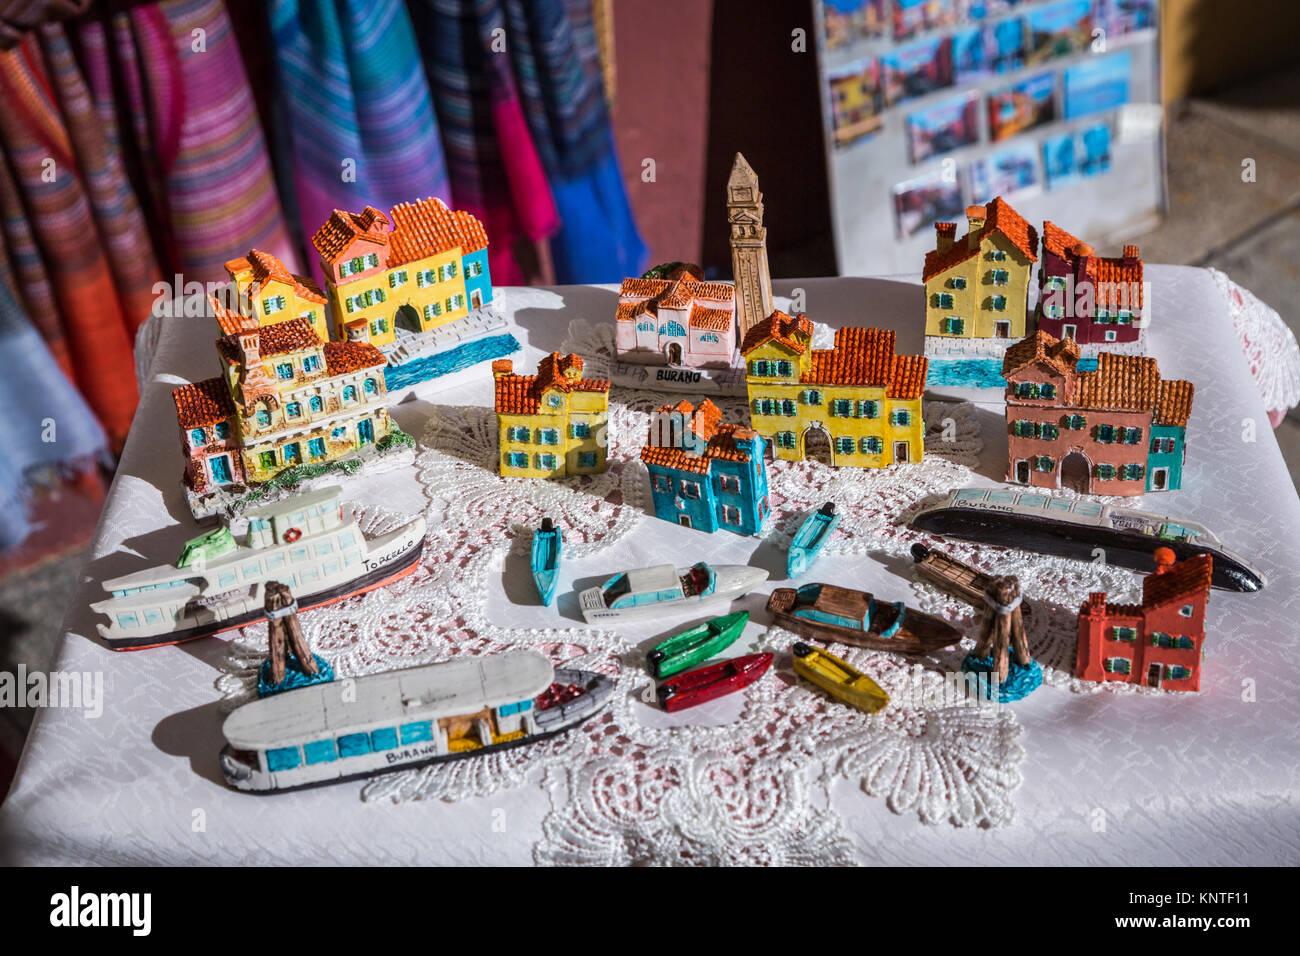 Produkte für den Verkauf in den venezianischen Dorf Burano, Venedig, Italien, Europa. Stockbild